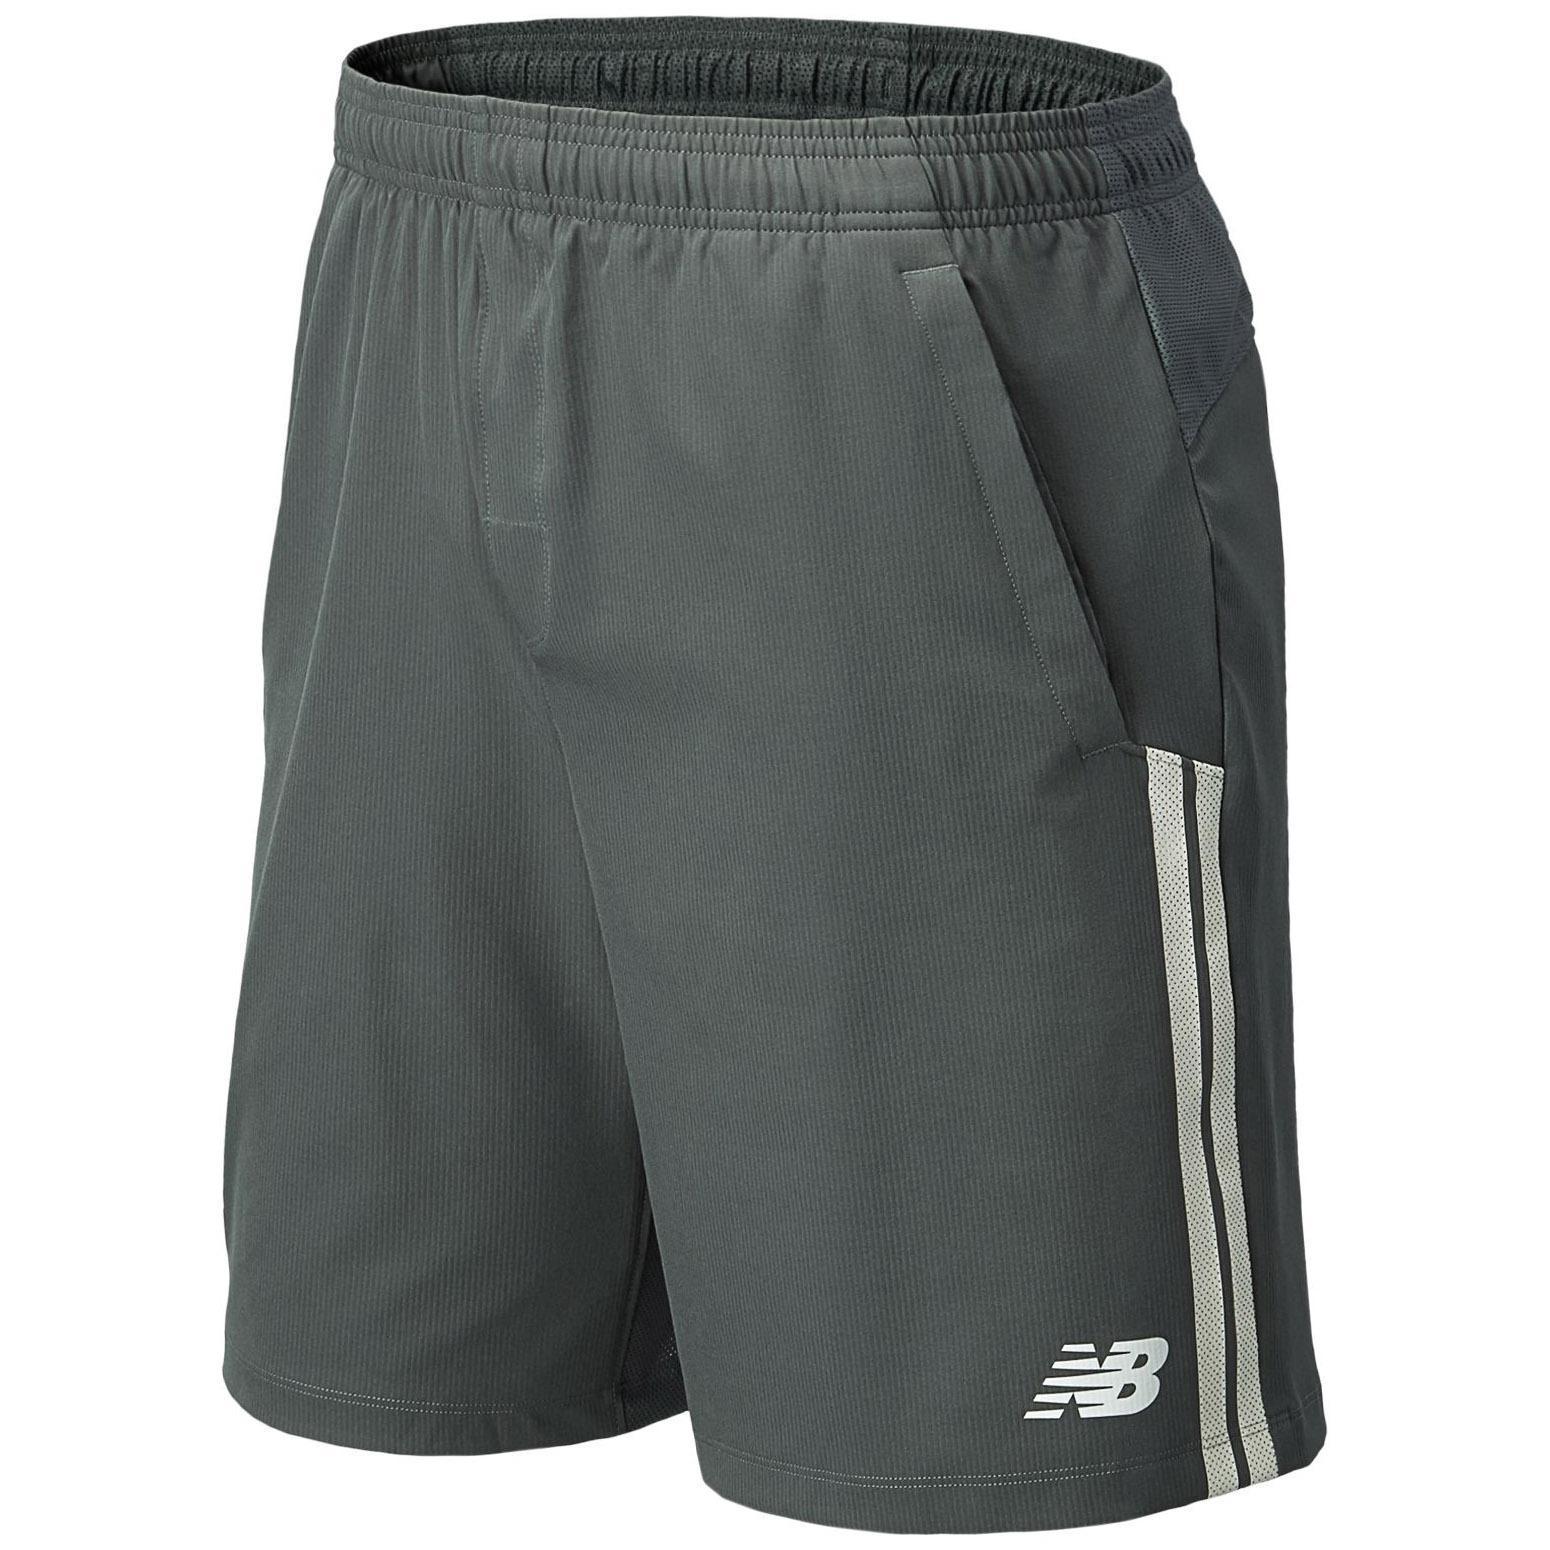 0cf6c79236cb7 New Balance Mens Tournament 9 Inch Shorts - Lead - Tennisnuts.com